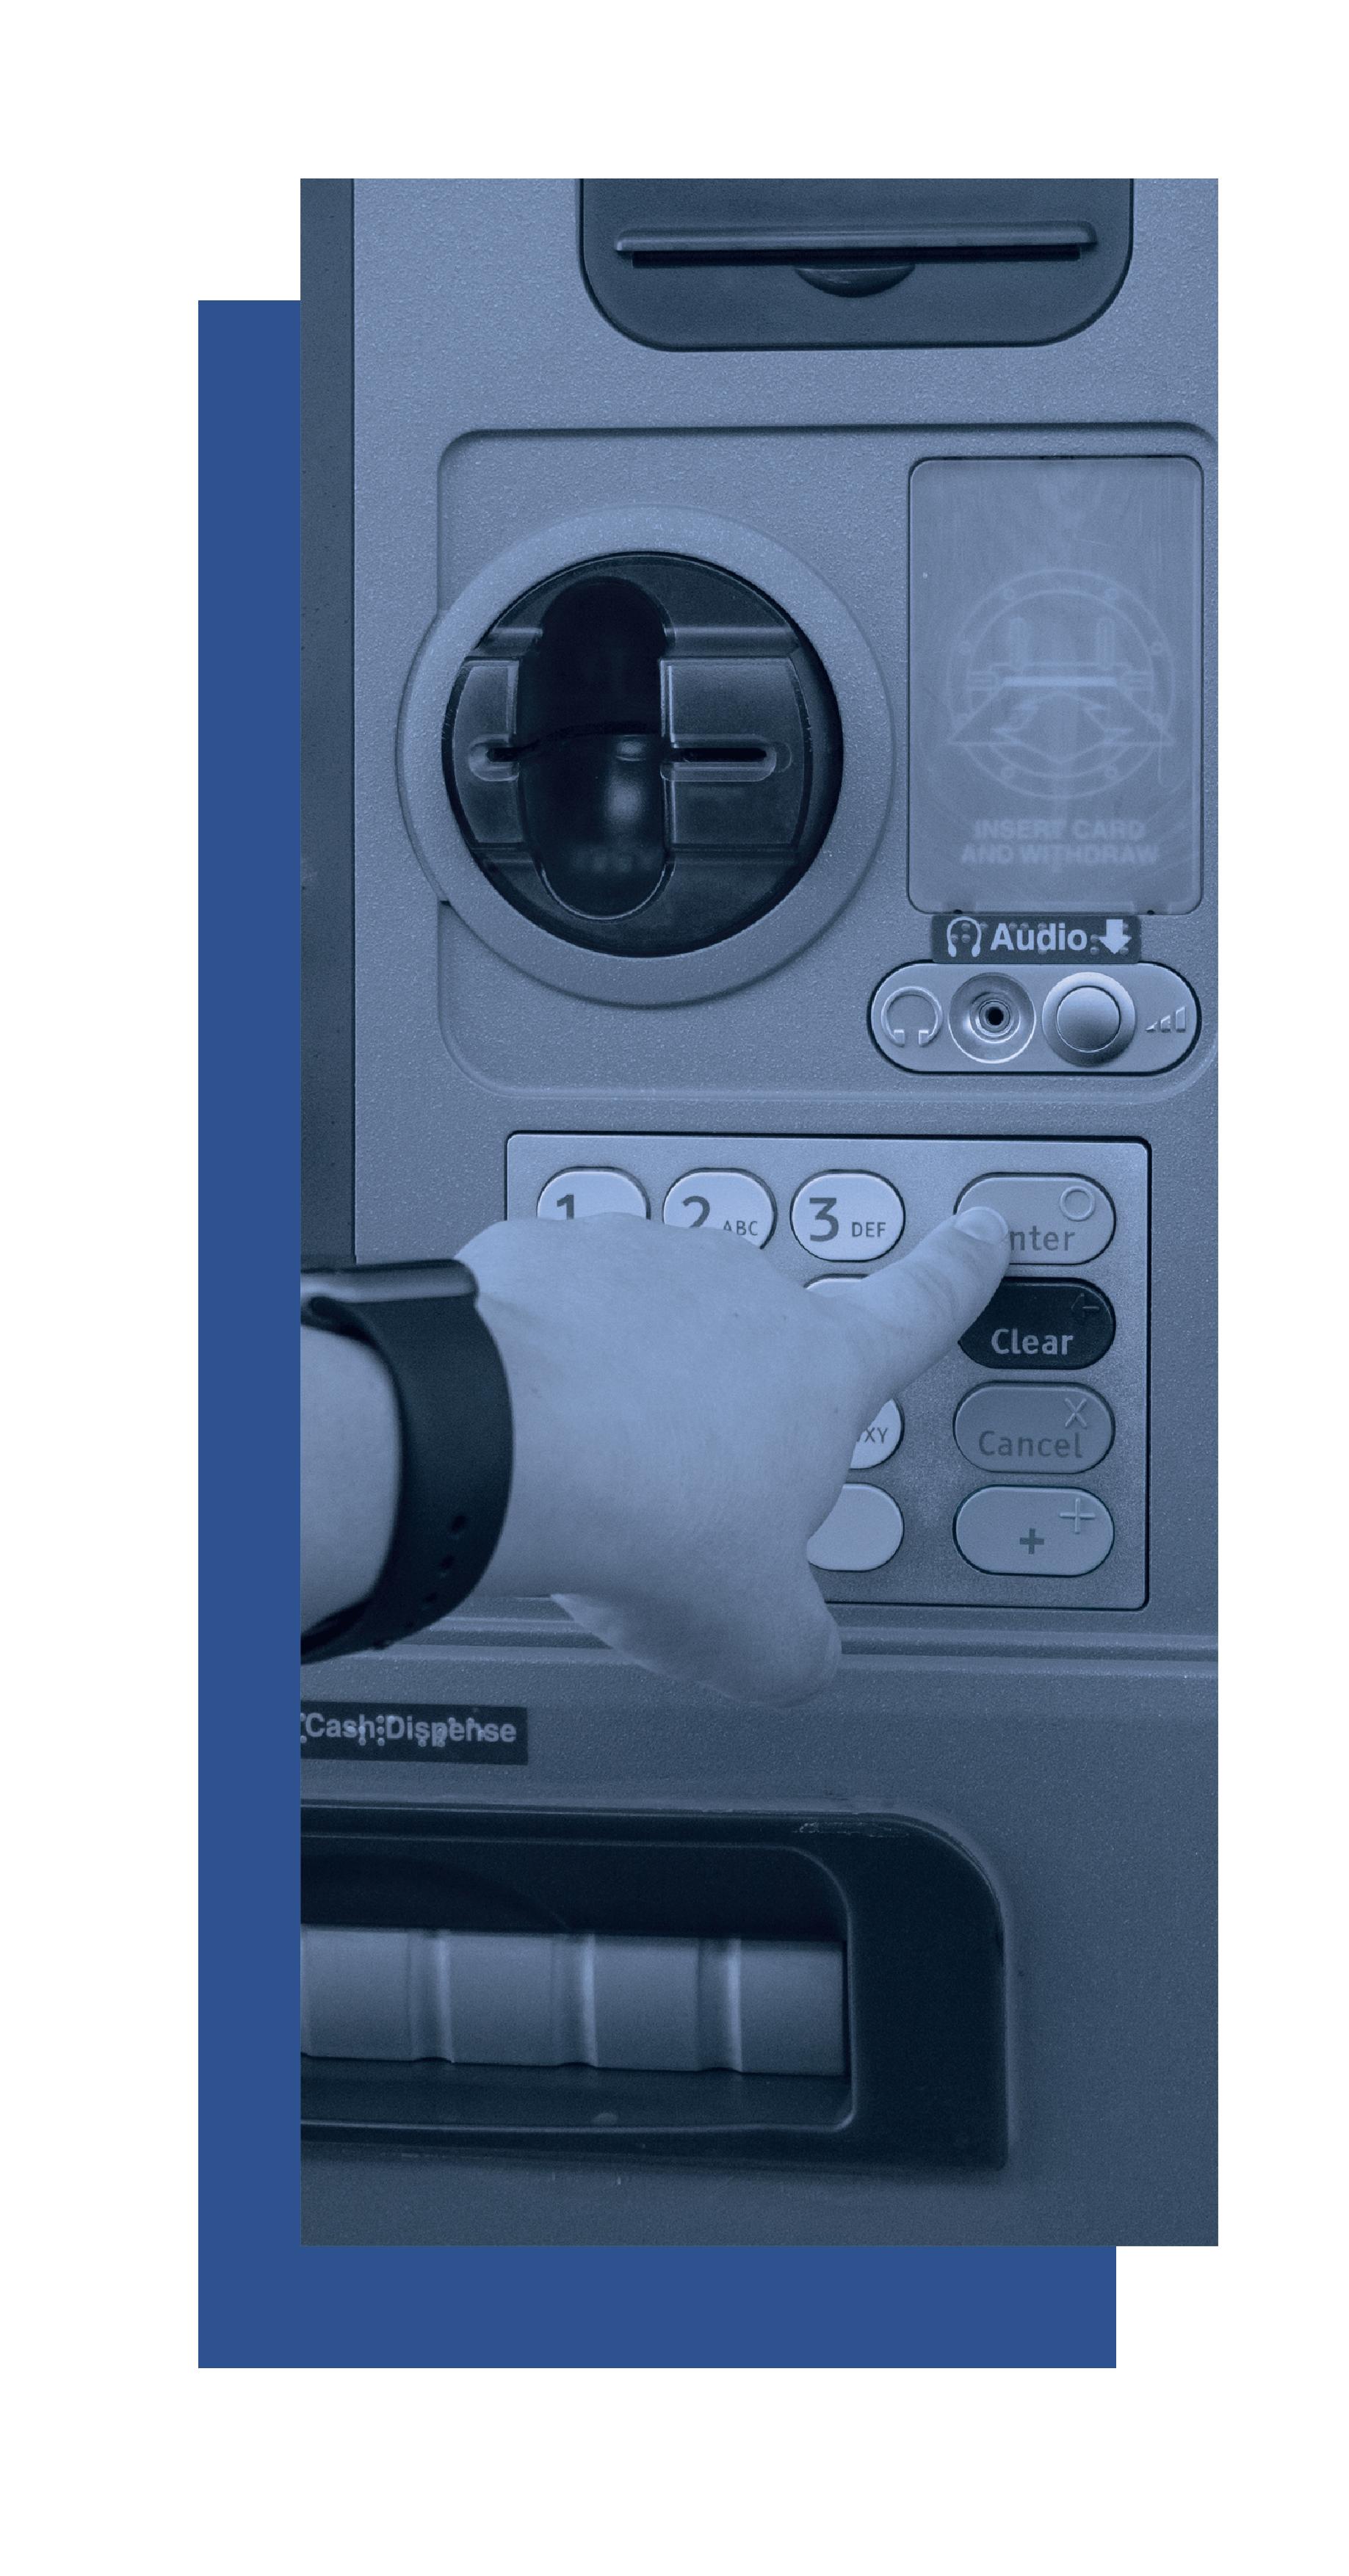 DCU_ATM_Buttons.png